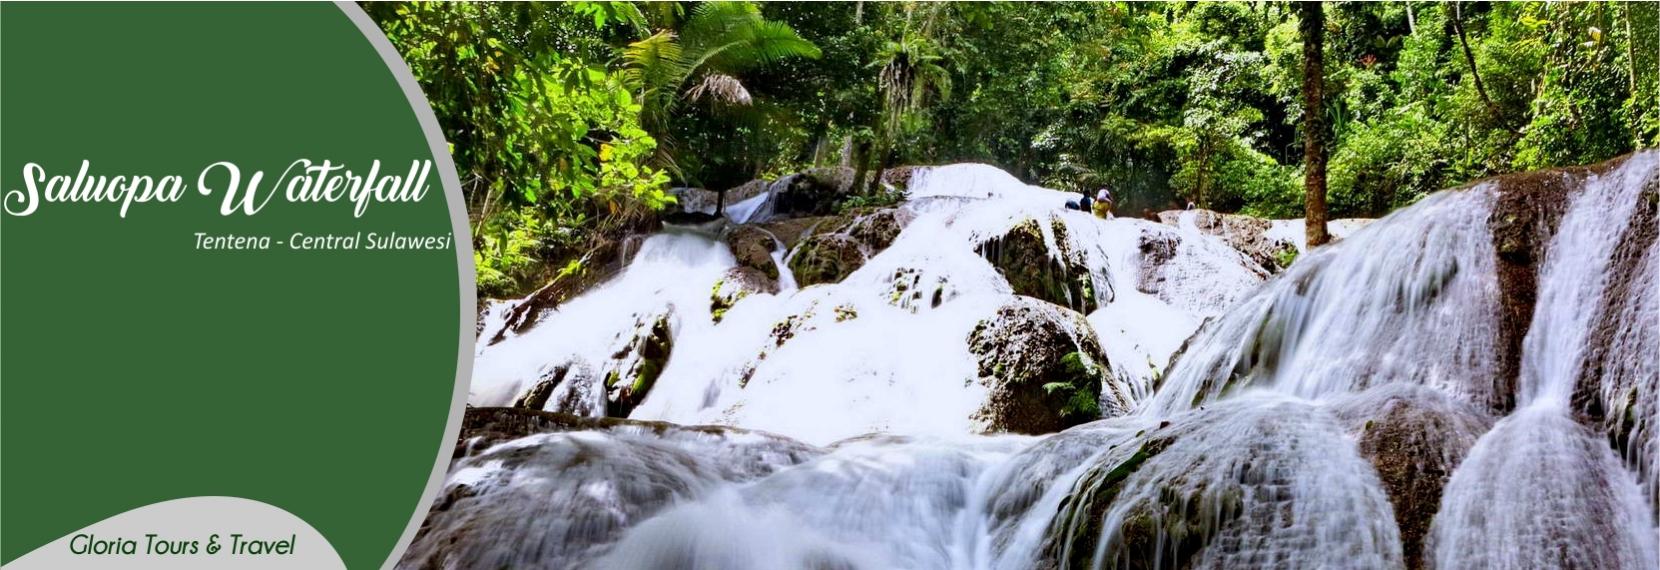 Saluopa Waterfall Centarl Sulawesi- Tentena